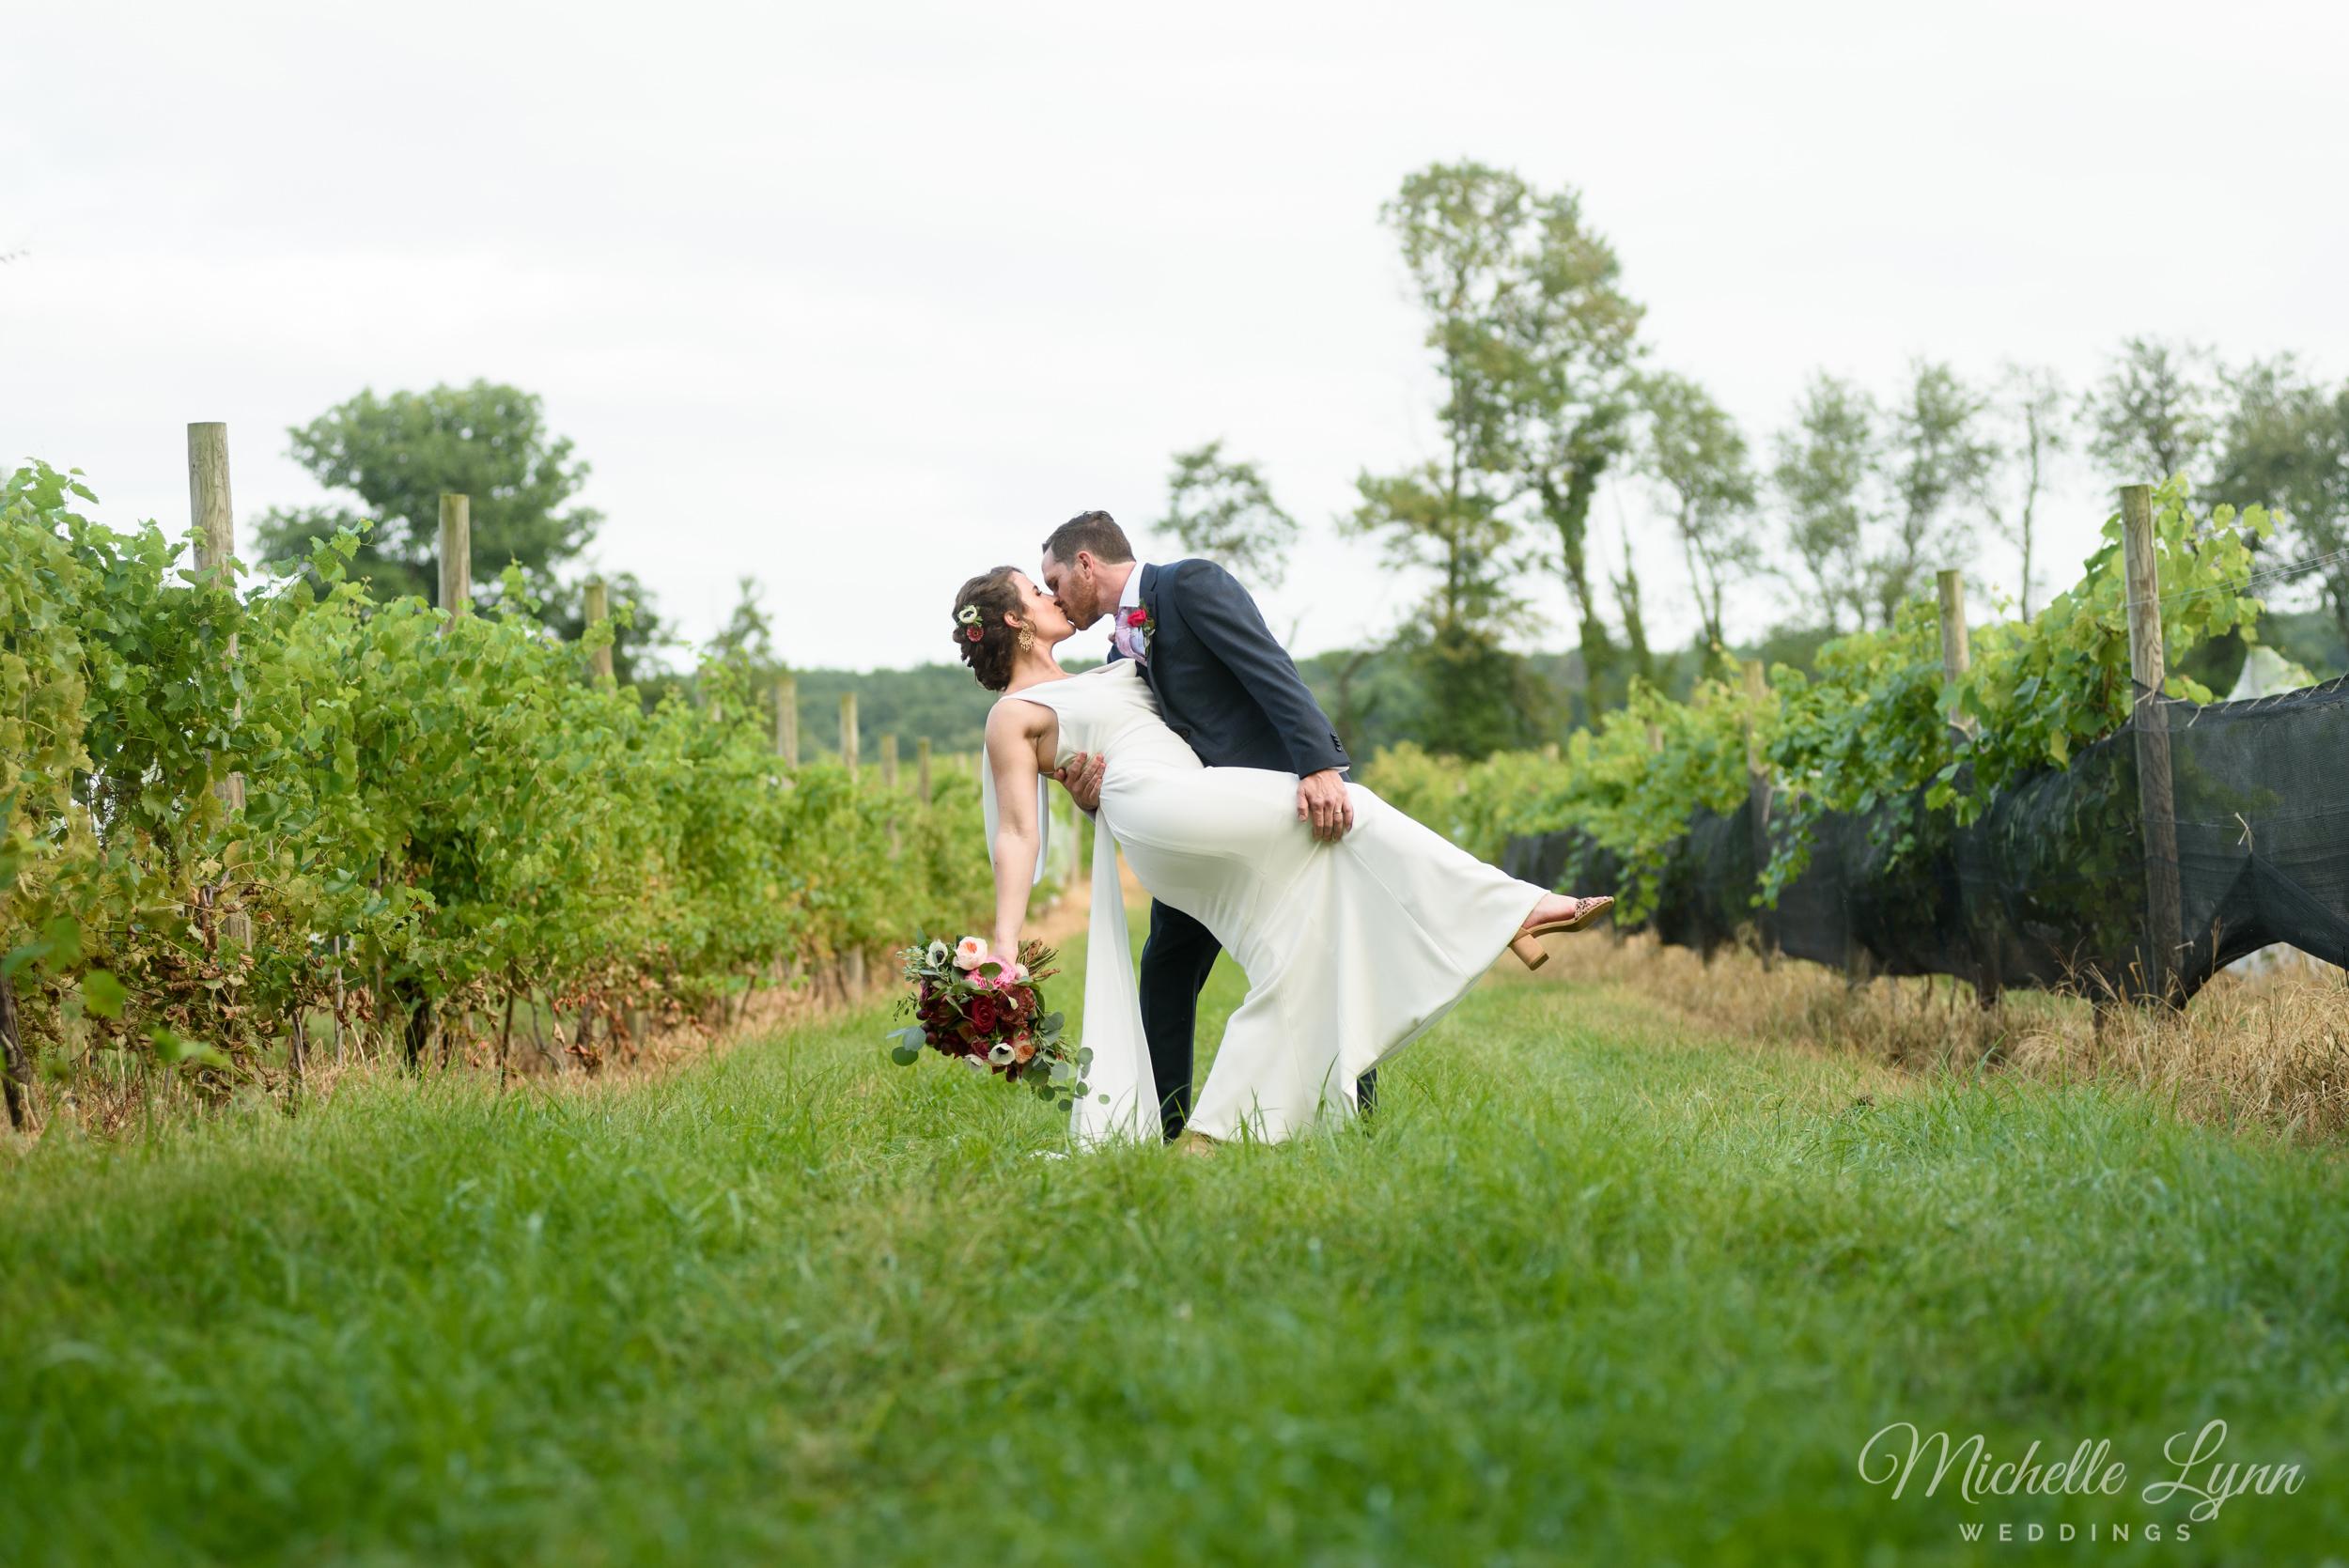 mlw-unionville-vineyards-nj-wedding-photography-67.jpg